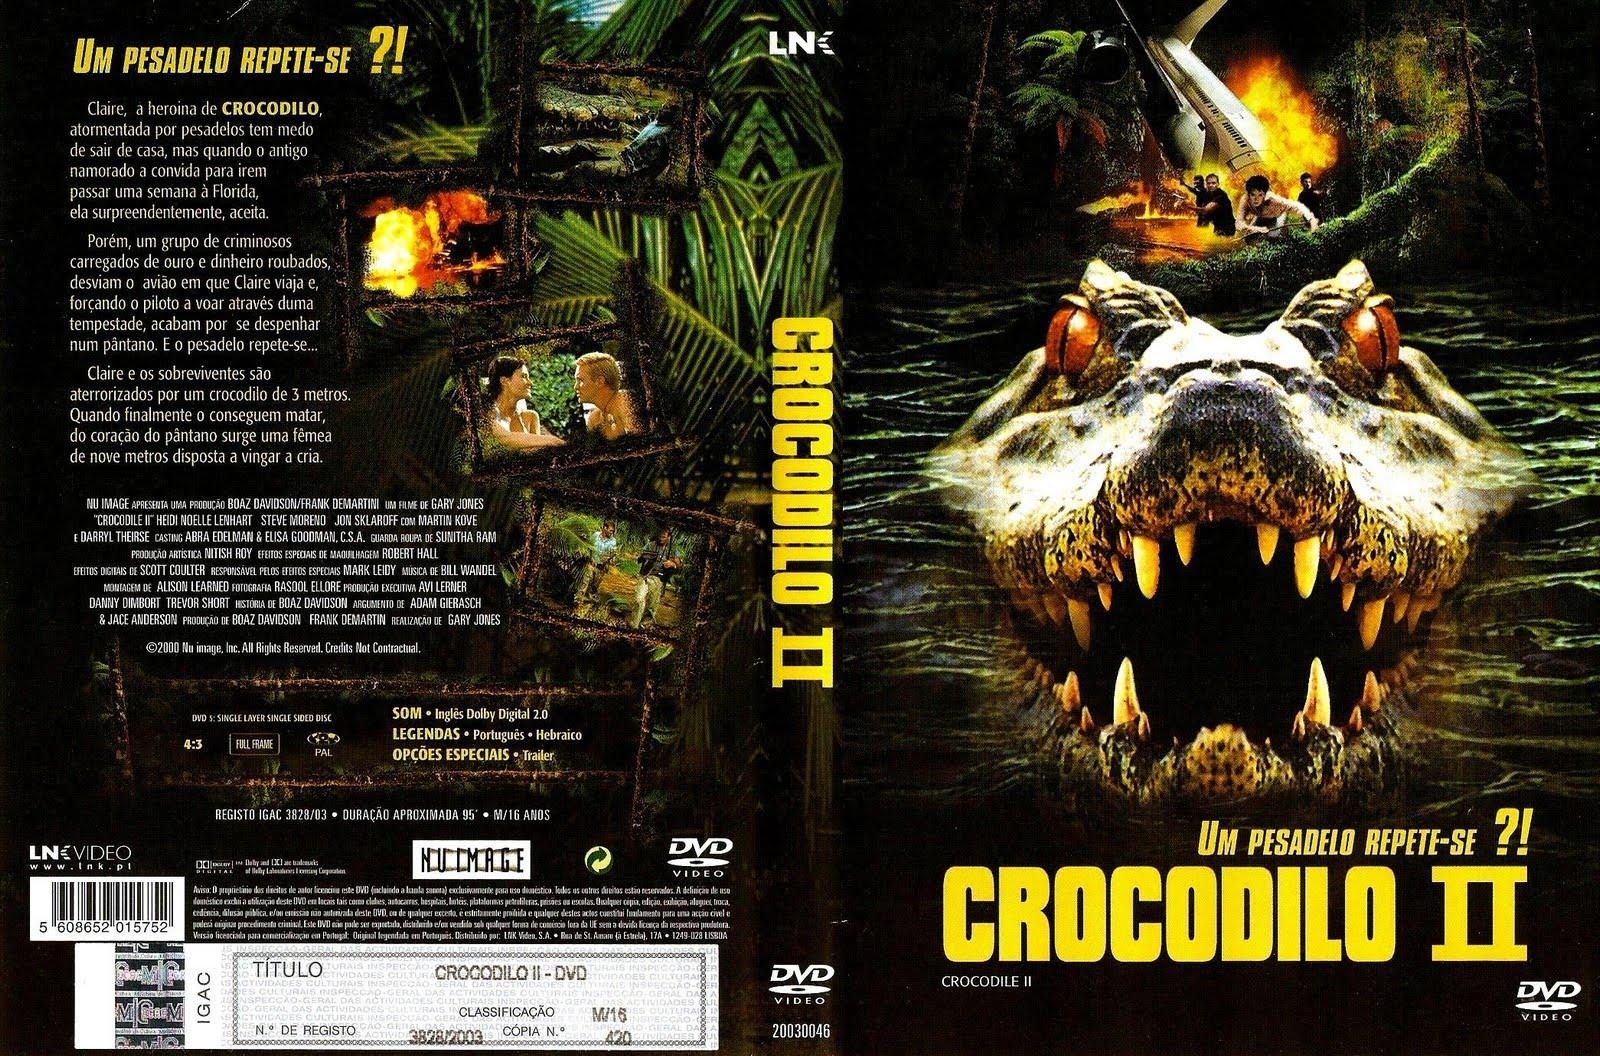 Crocodilo dundee 2 dublado completo online dating 10